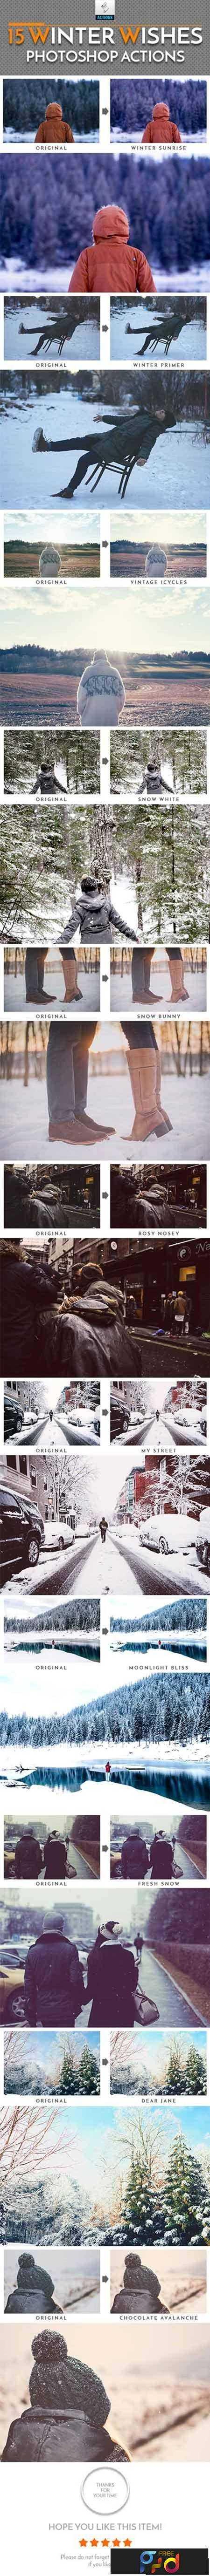 FreePsdVn.com_1702340_PHOTOSHOP_15_winter_wishes_photoshop_actions_19193002